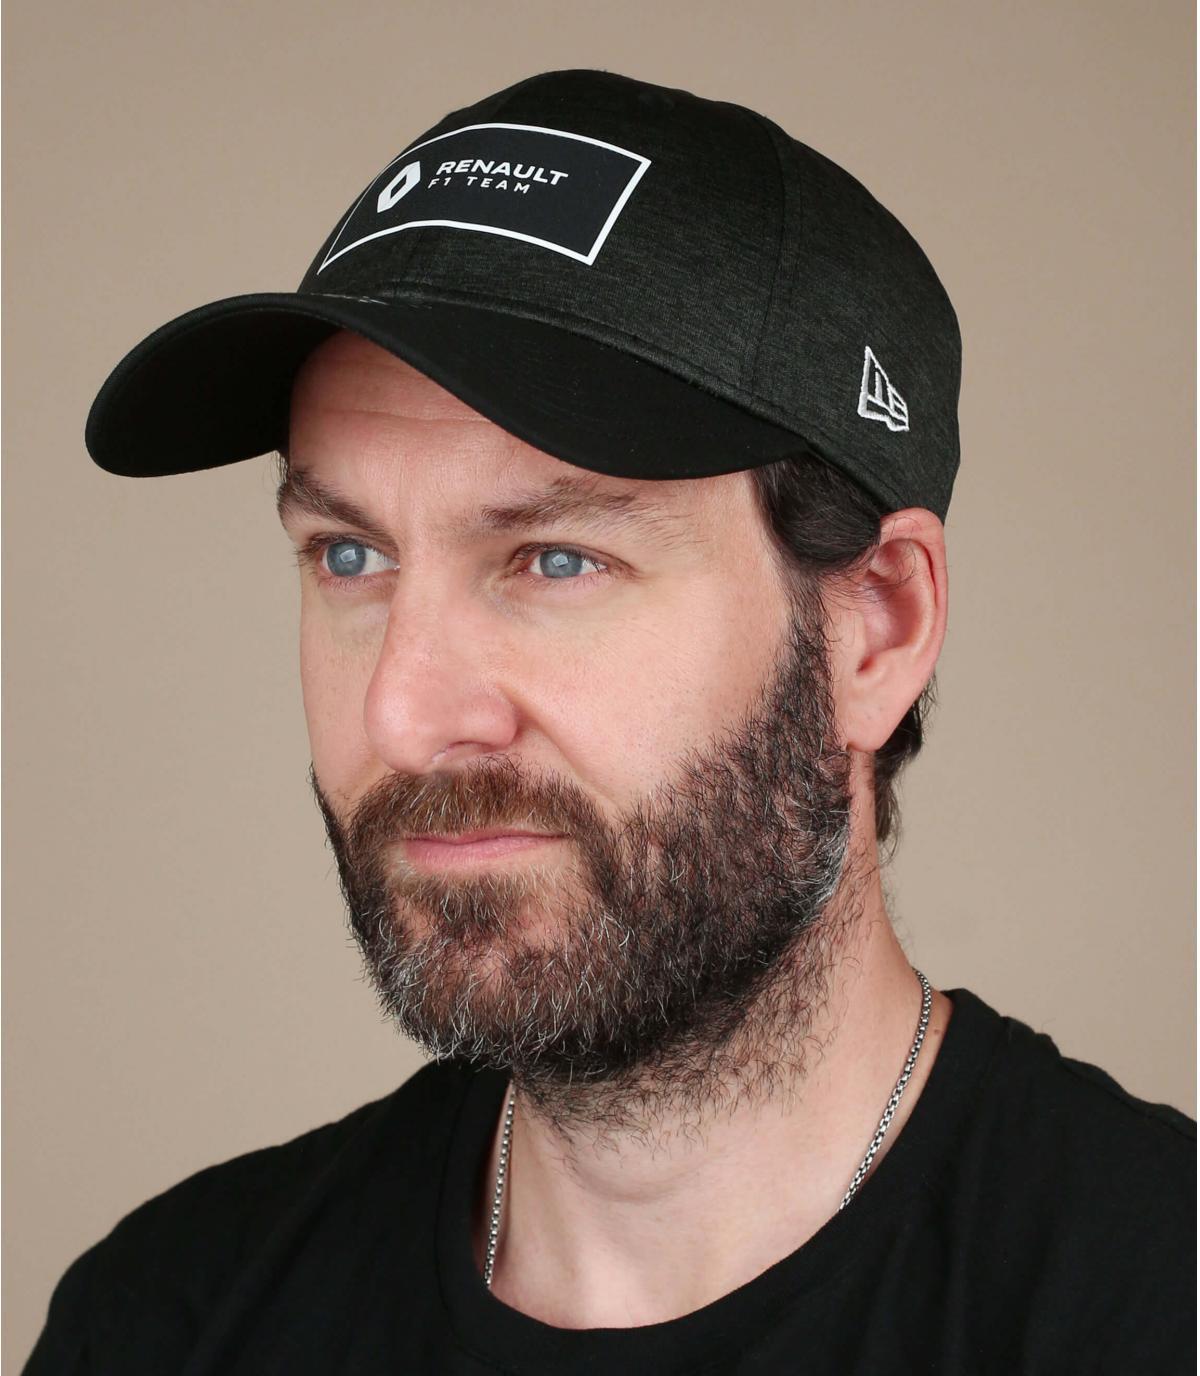 cappellino Renault nero